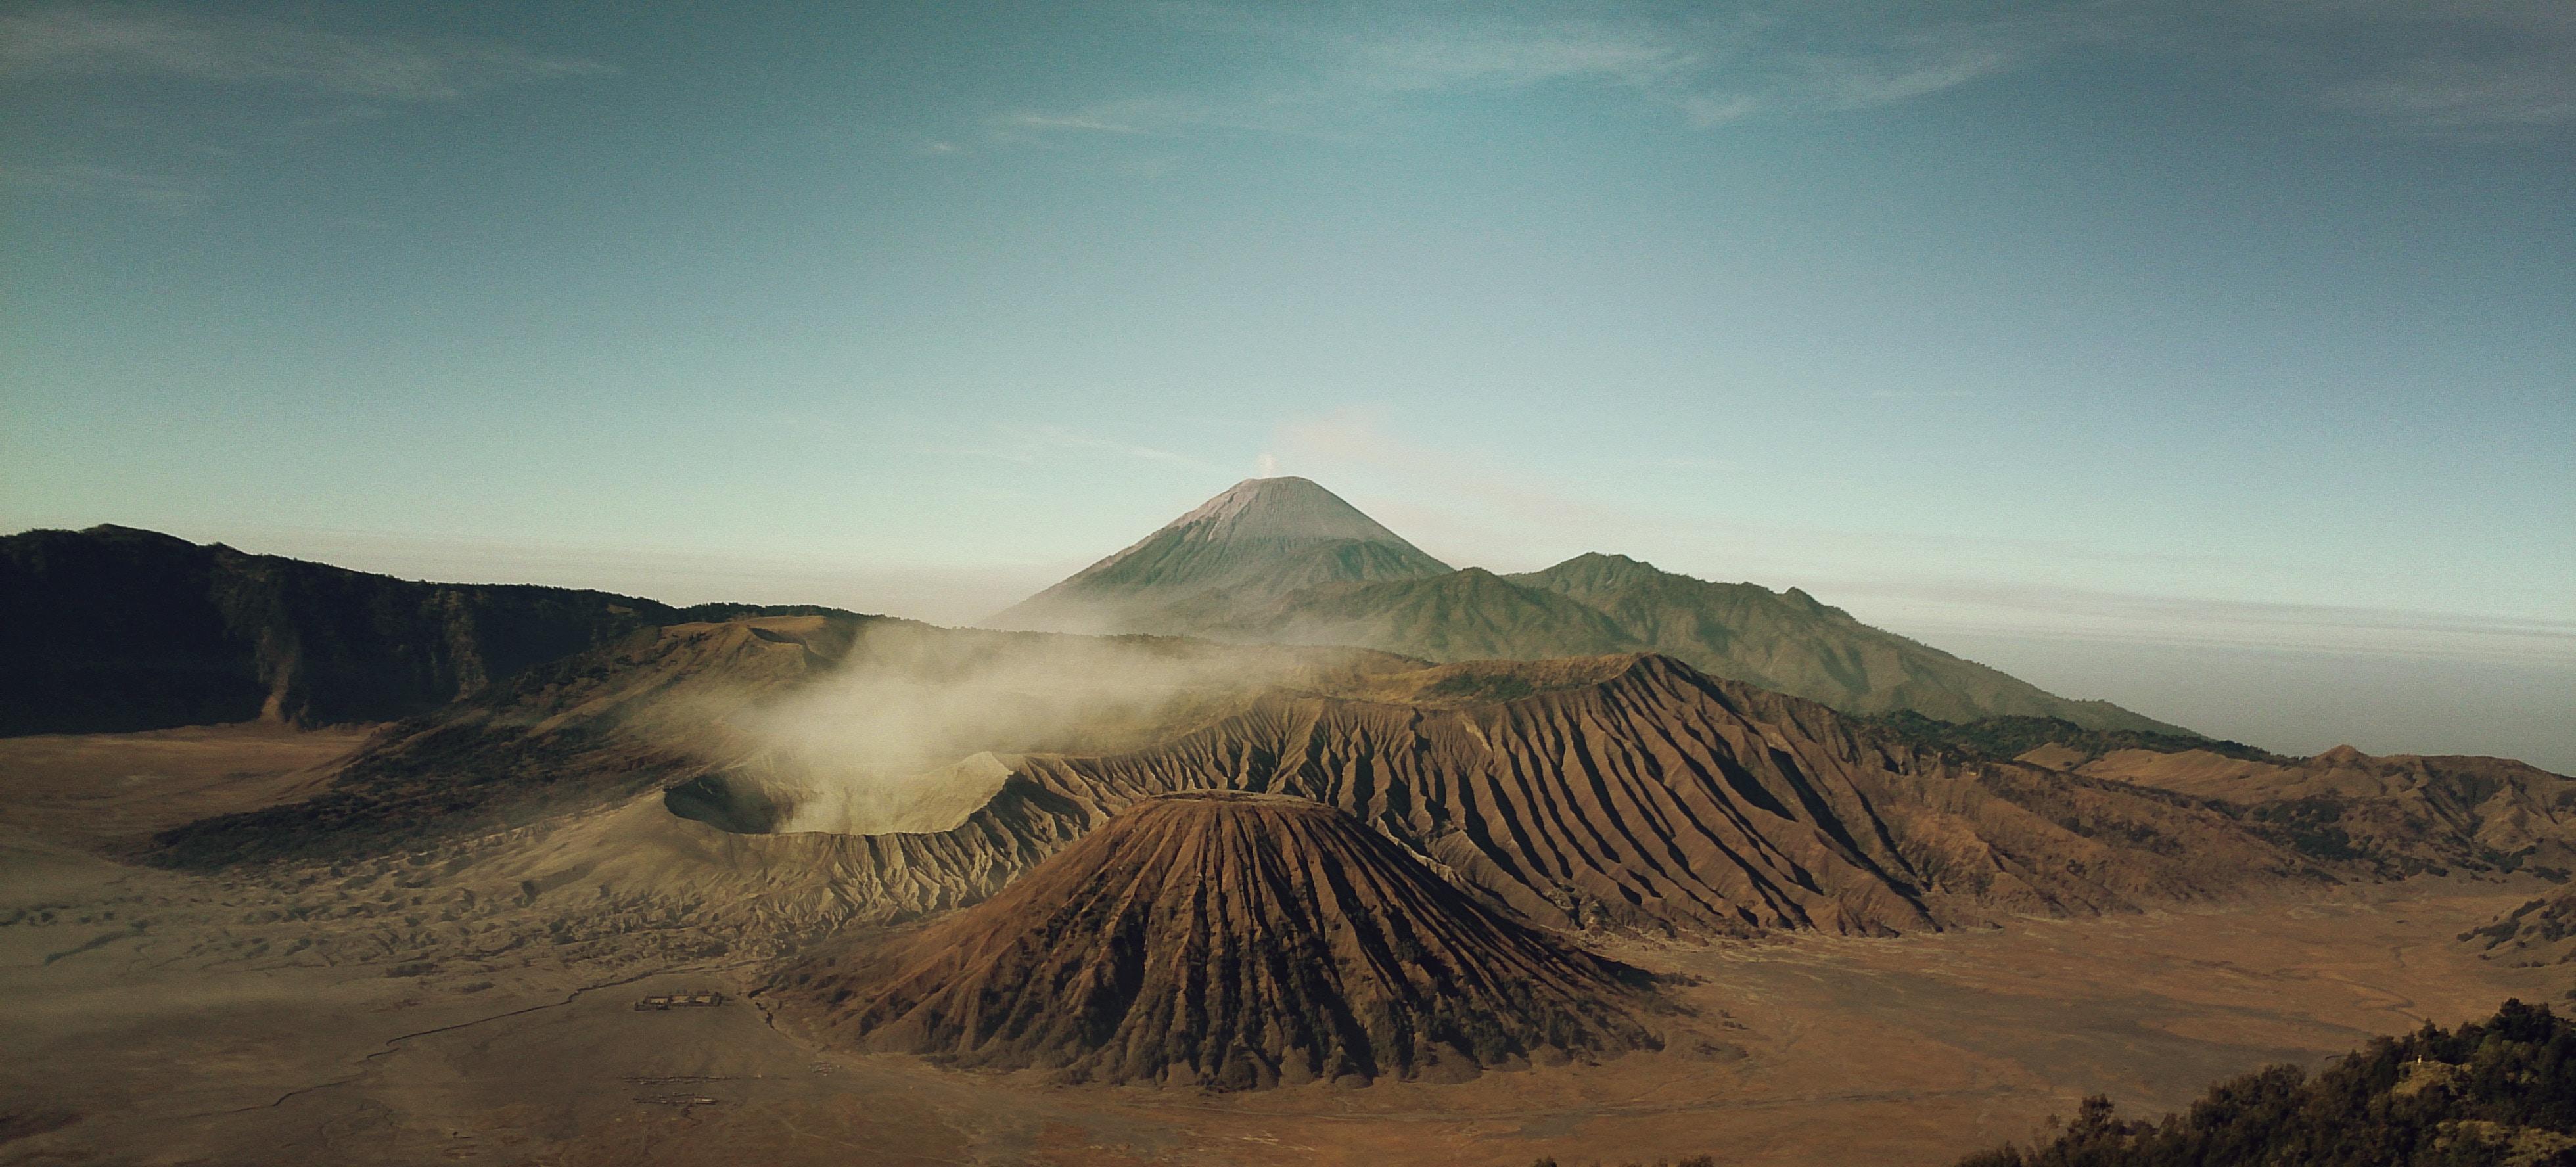 high angle view of volcano